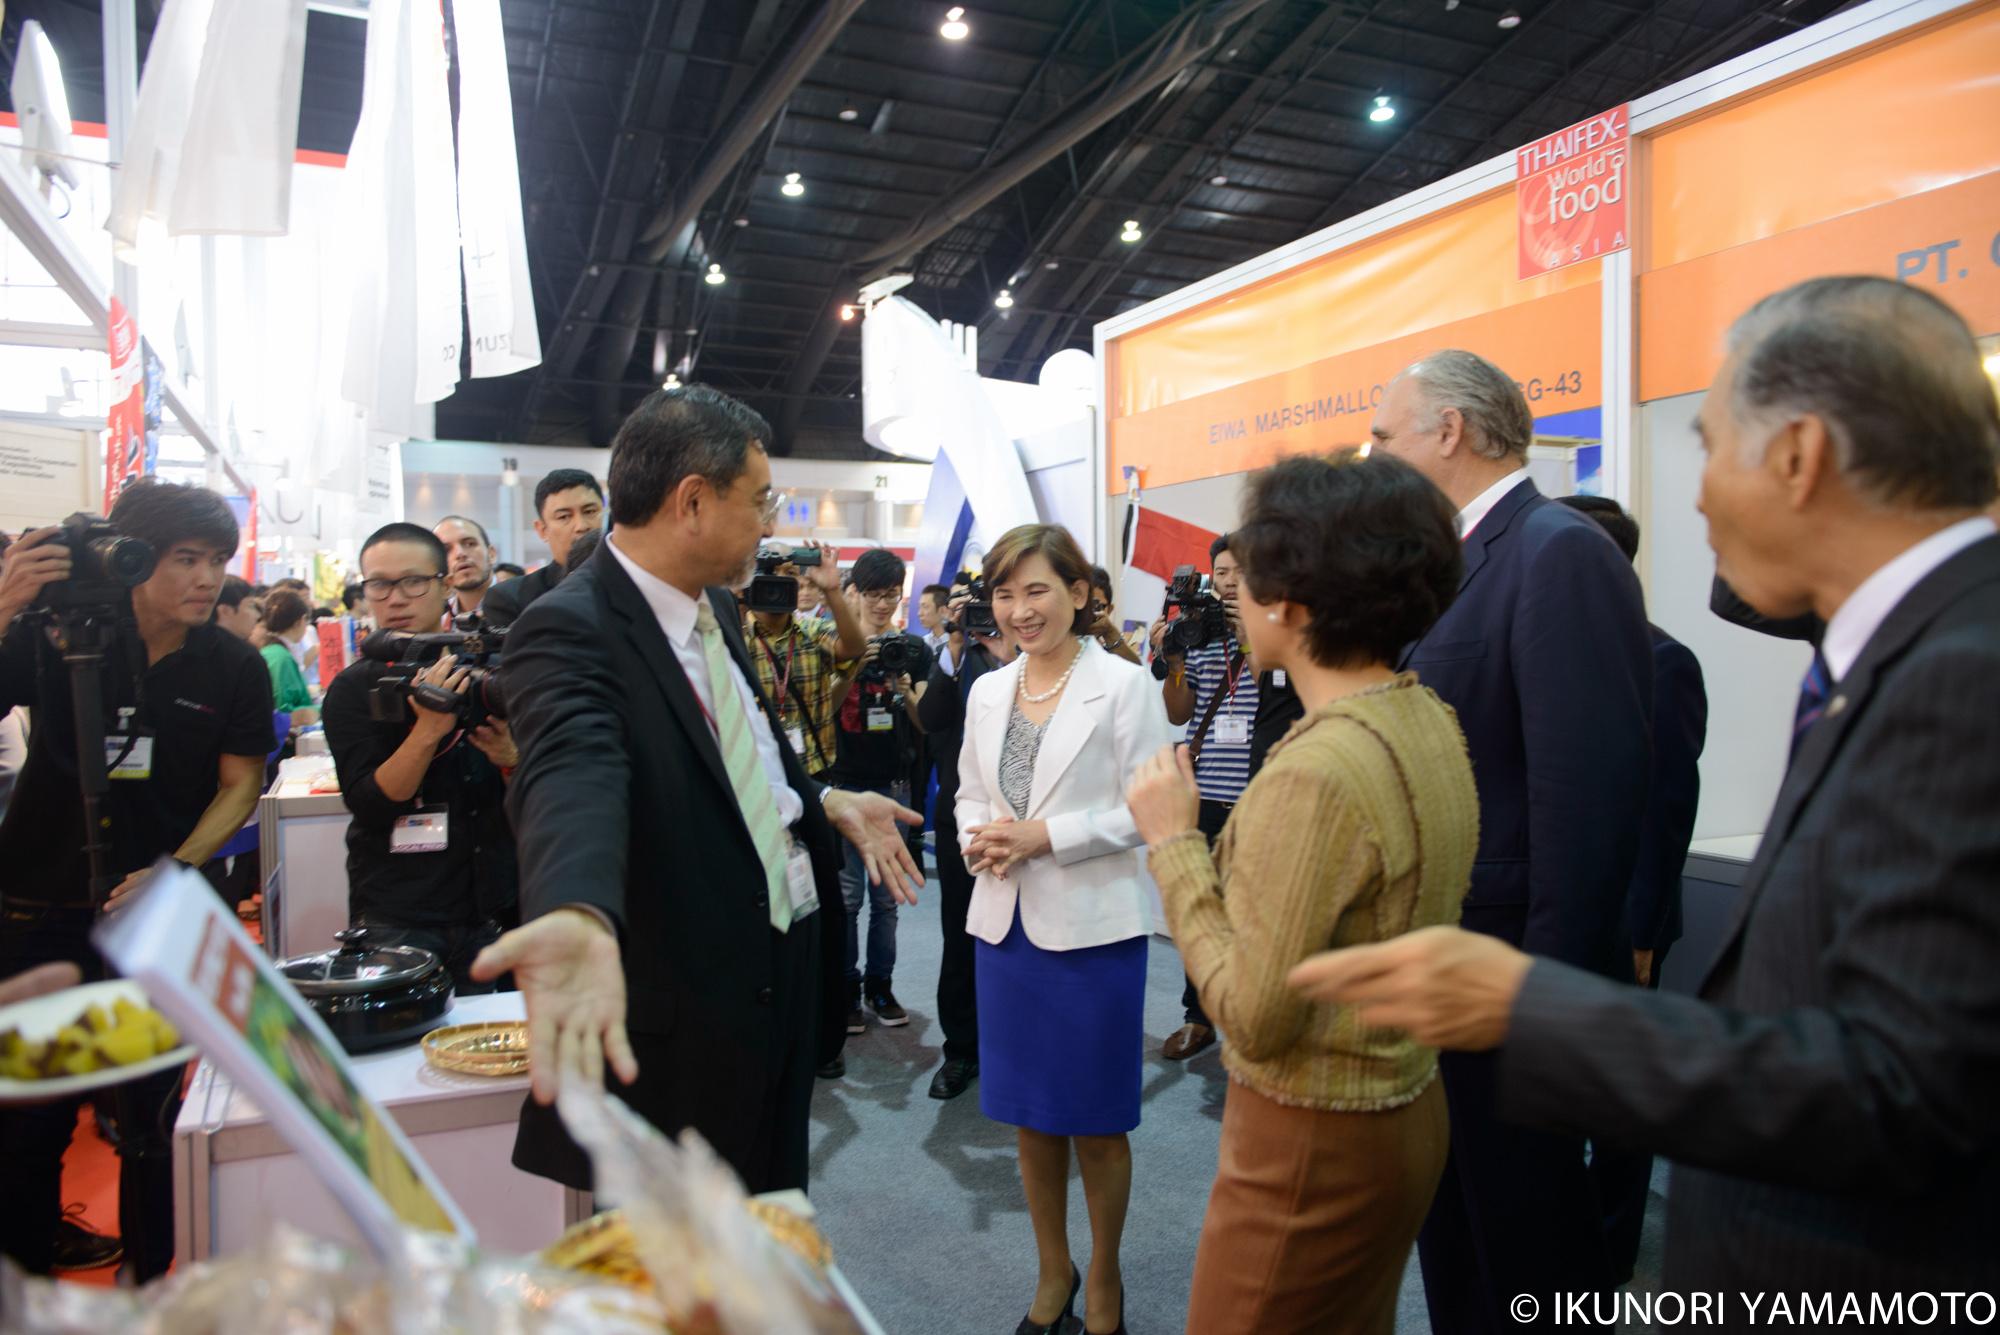 THAIFEX2014 JAPAN PAVILION